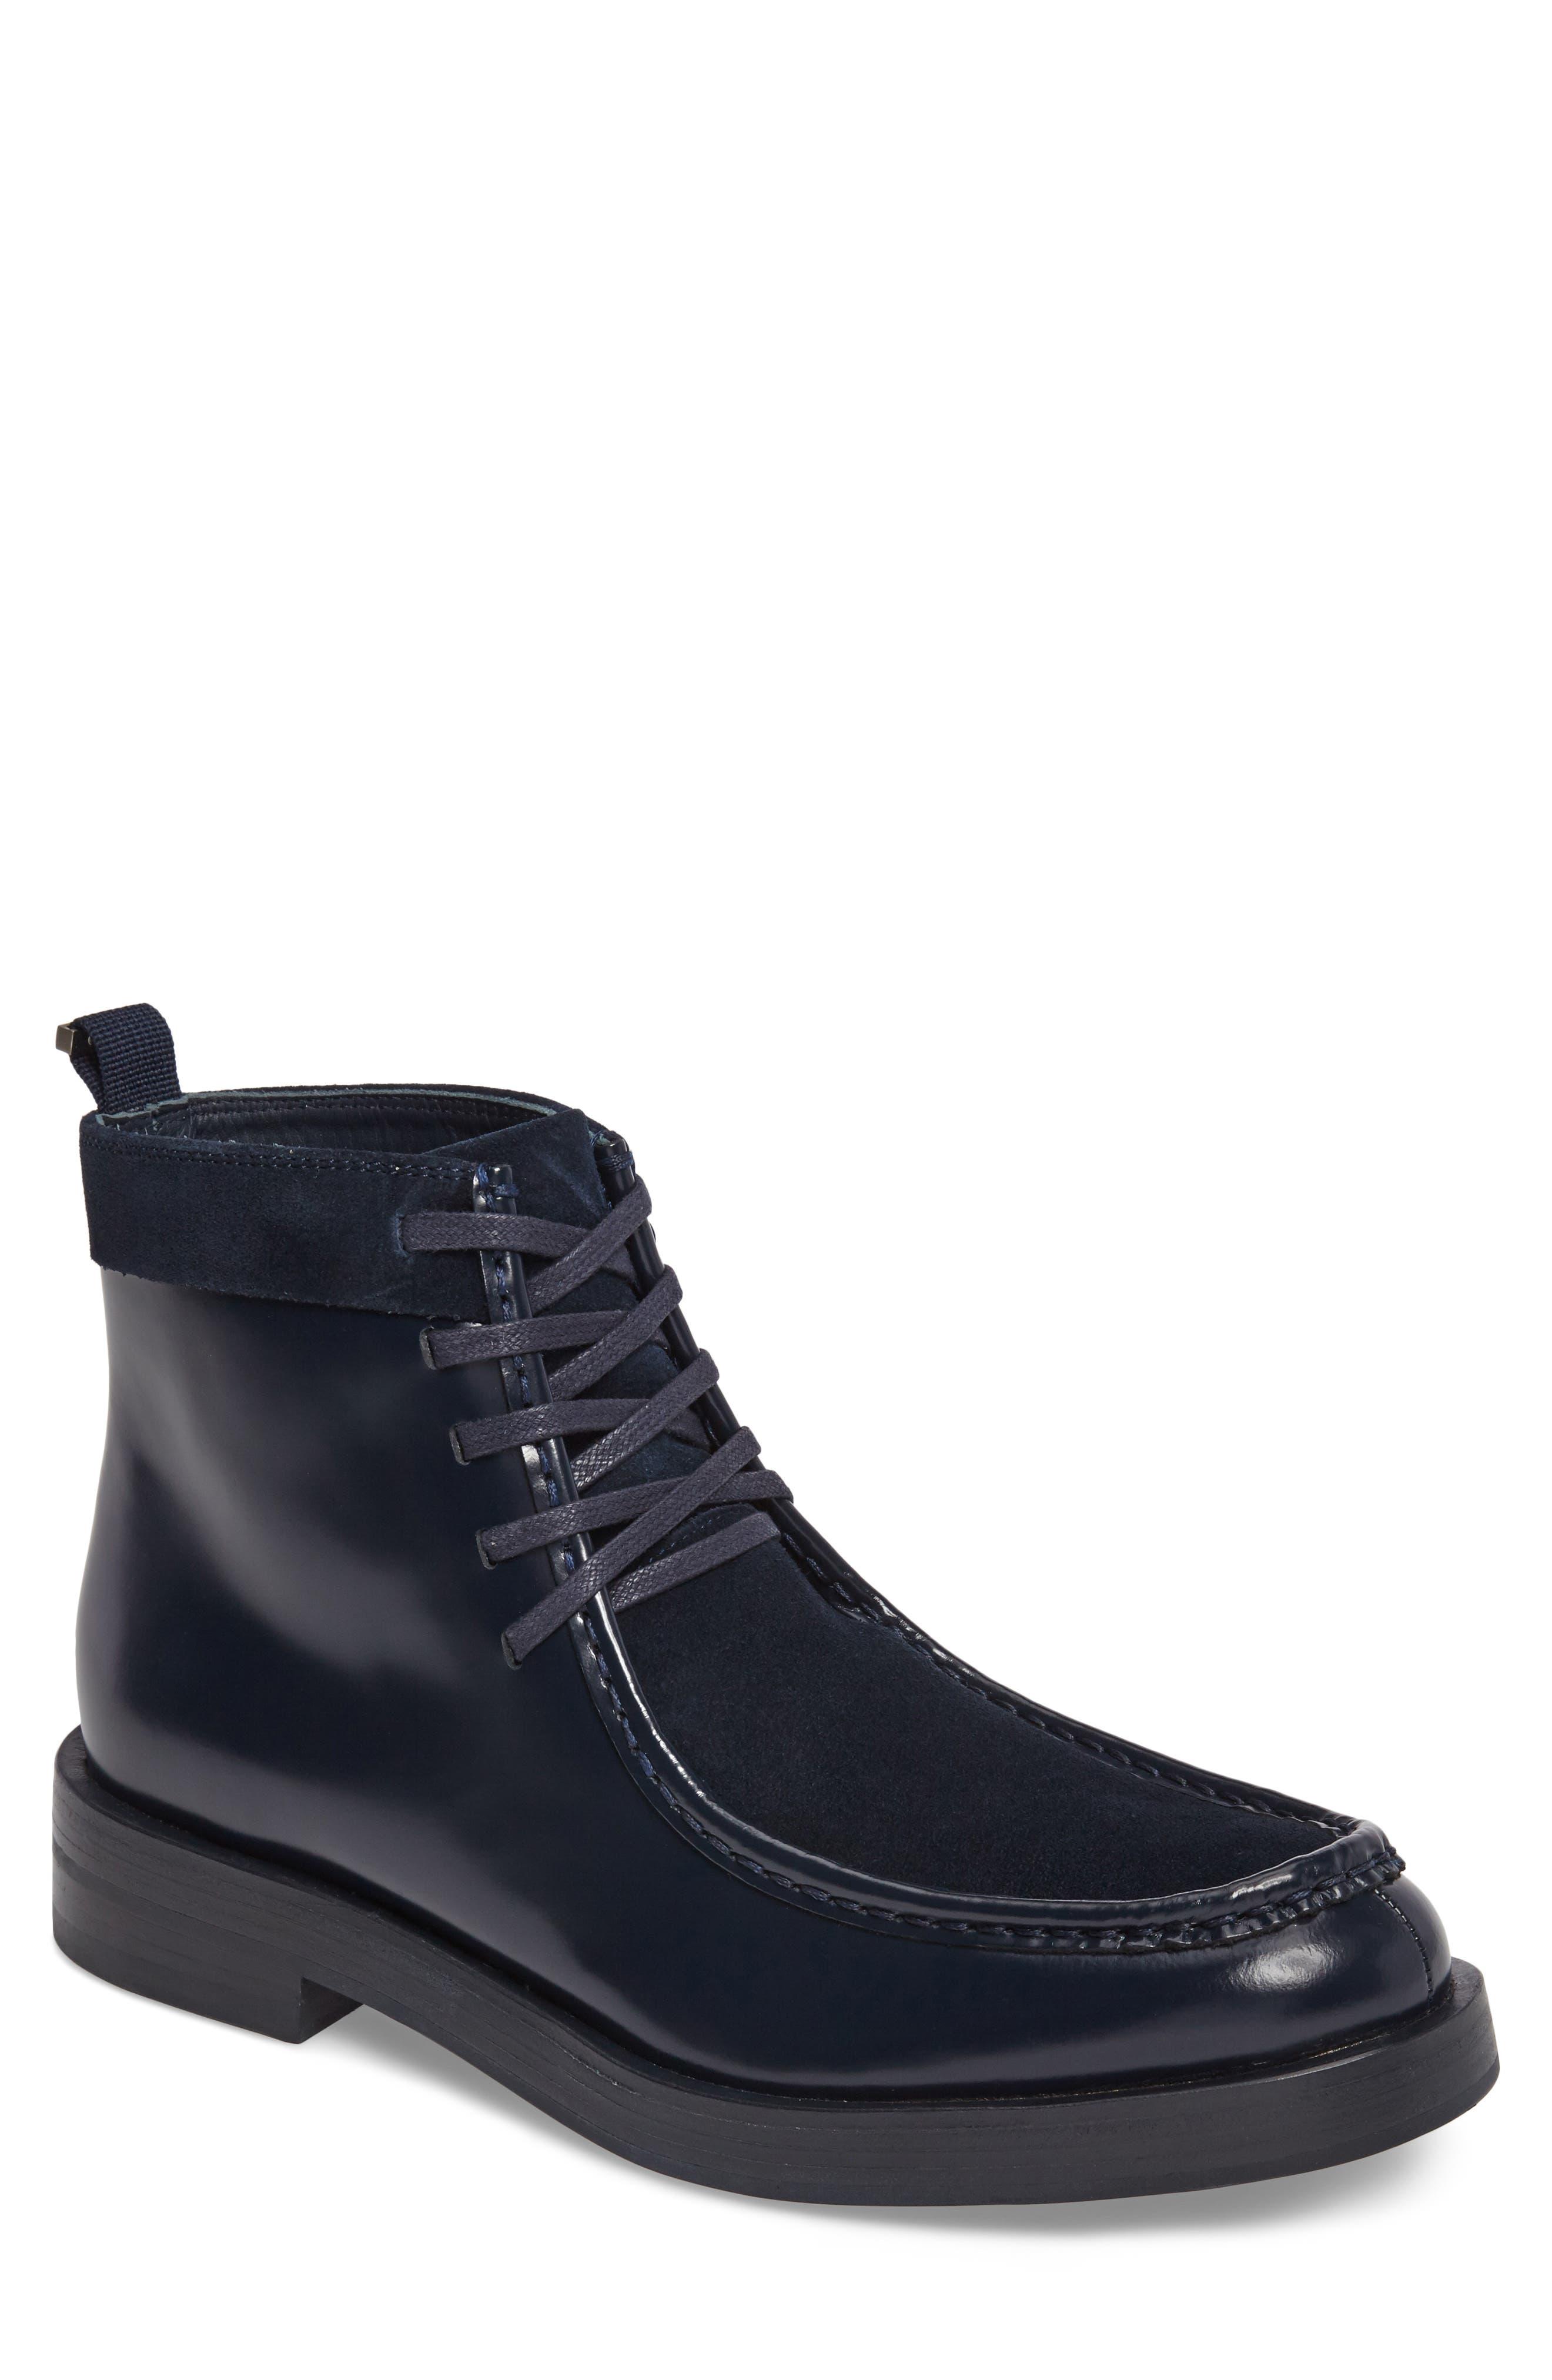 Rafi Moc Toe Boot,                             Main thumbnail 1, color,                             Dark Navy Leather